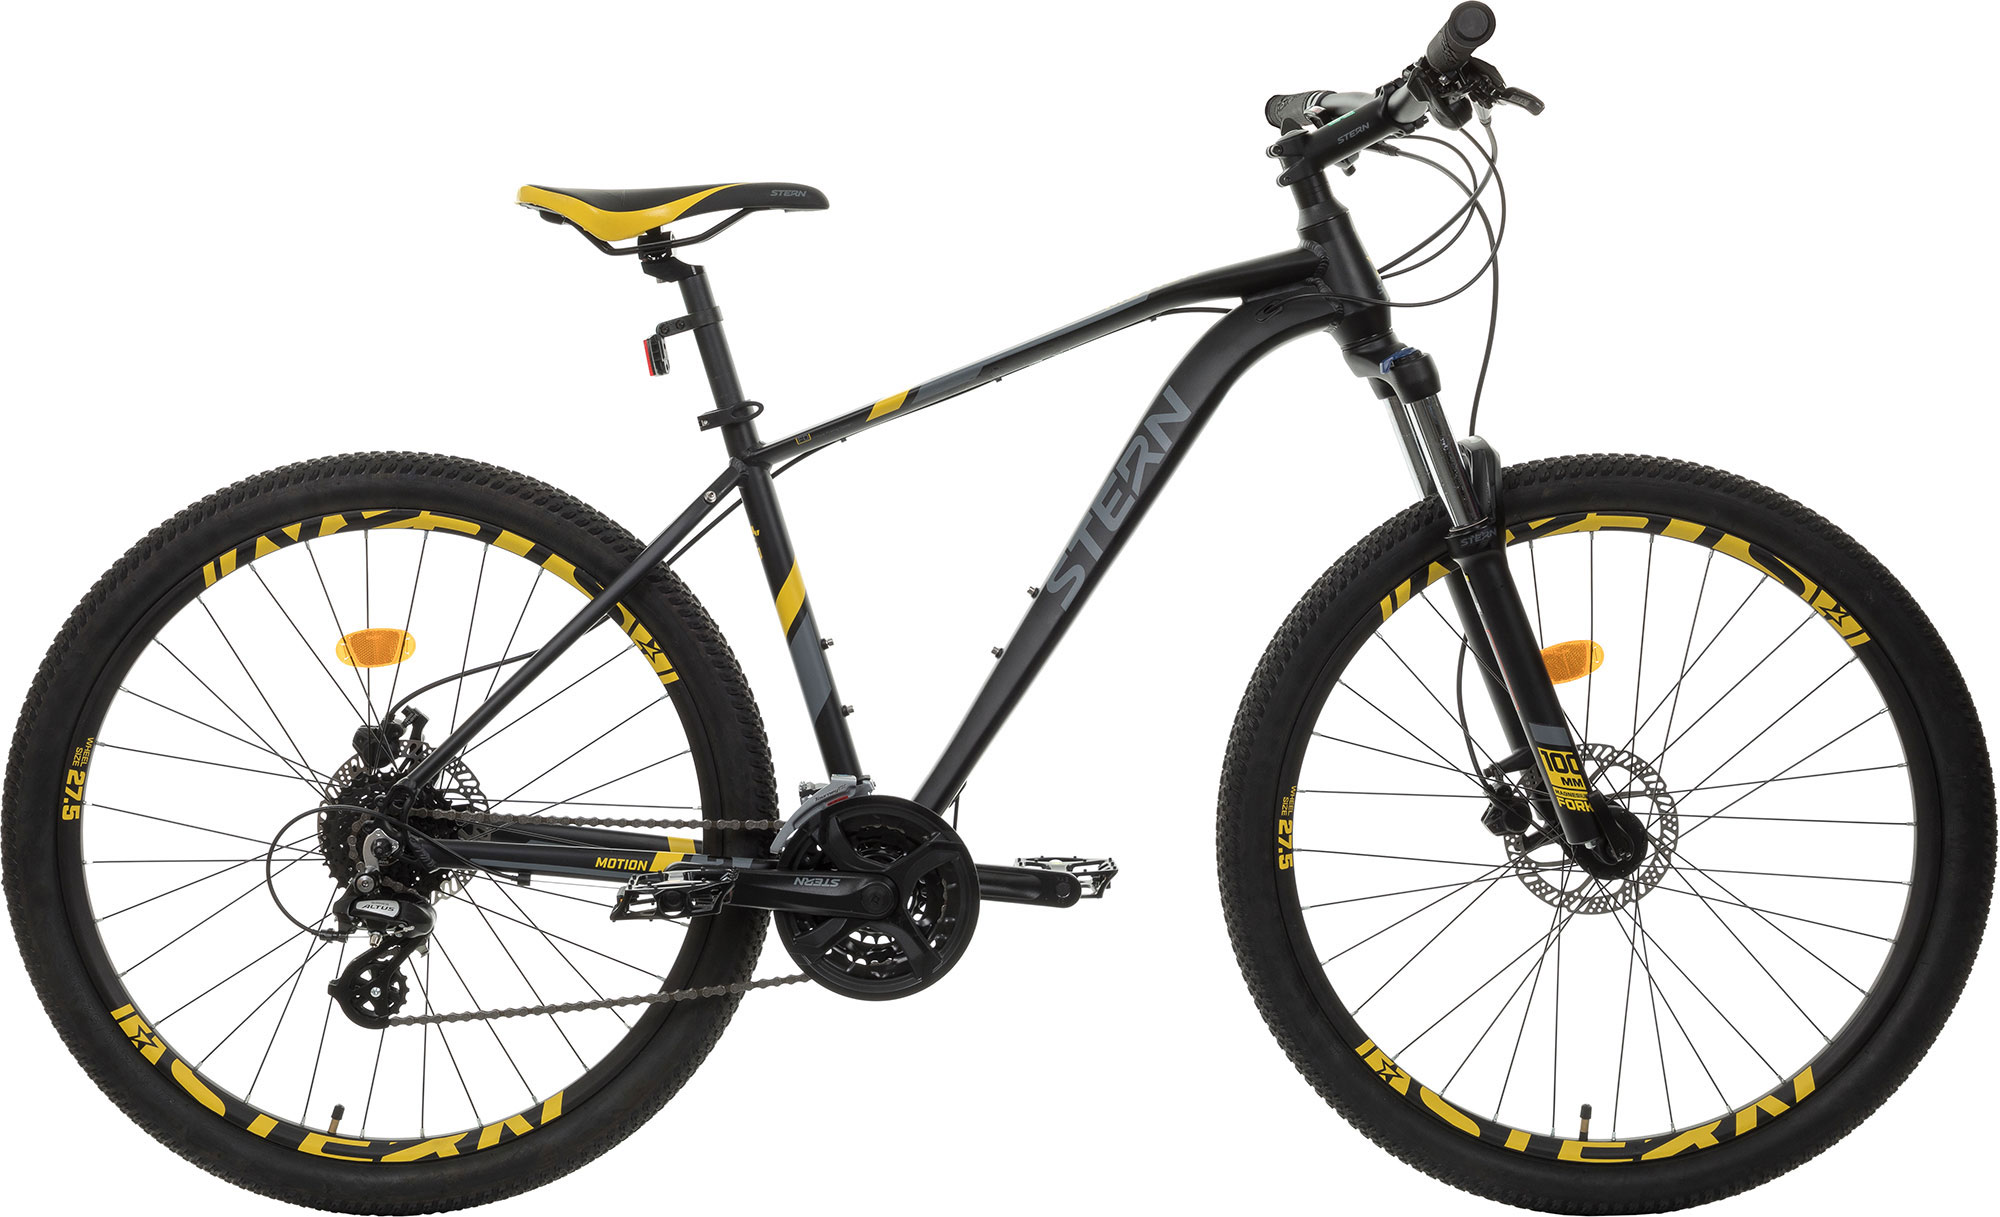 Stern Велосипед горный Motion 2.0 27,5